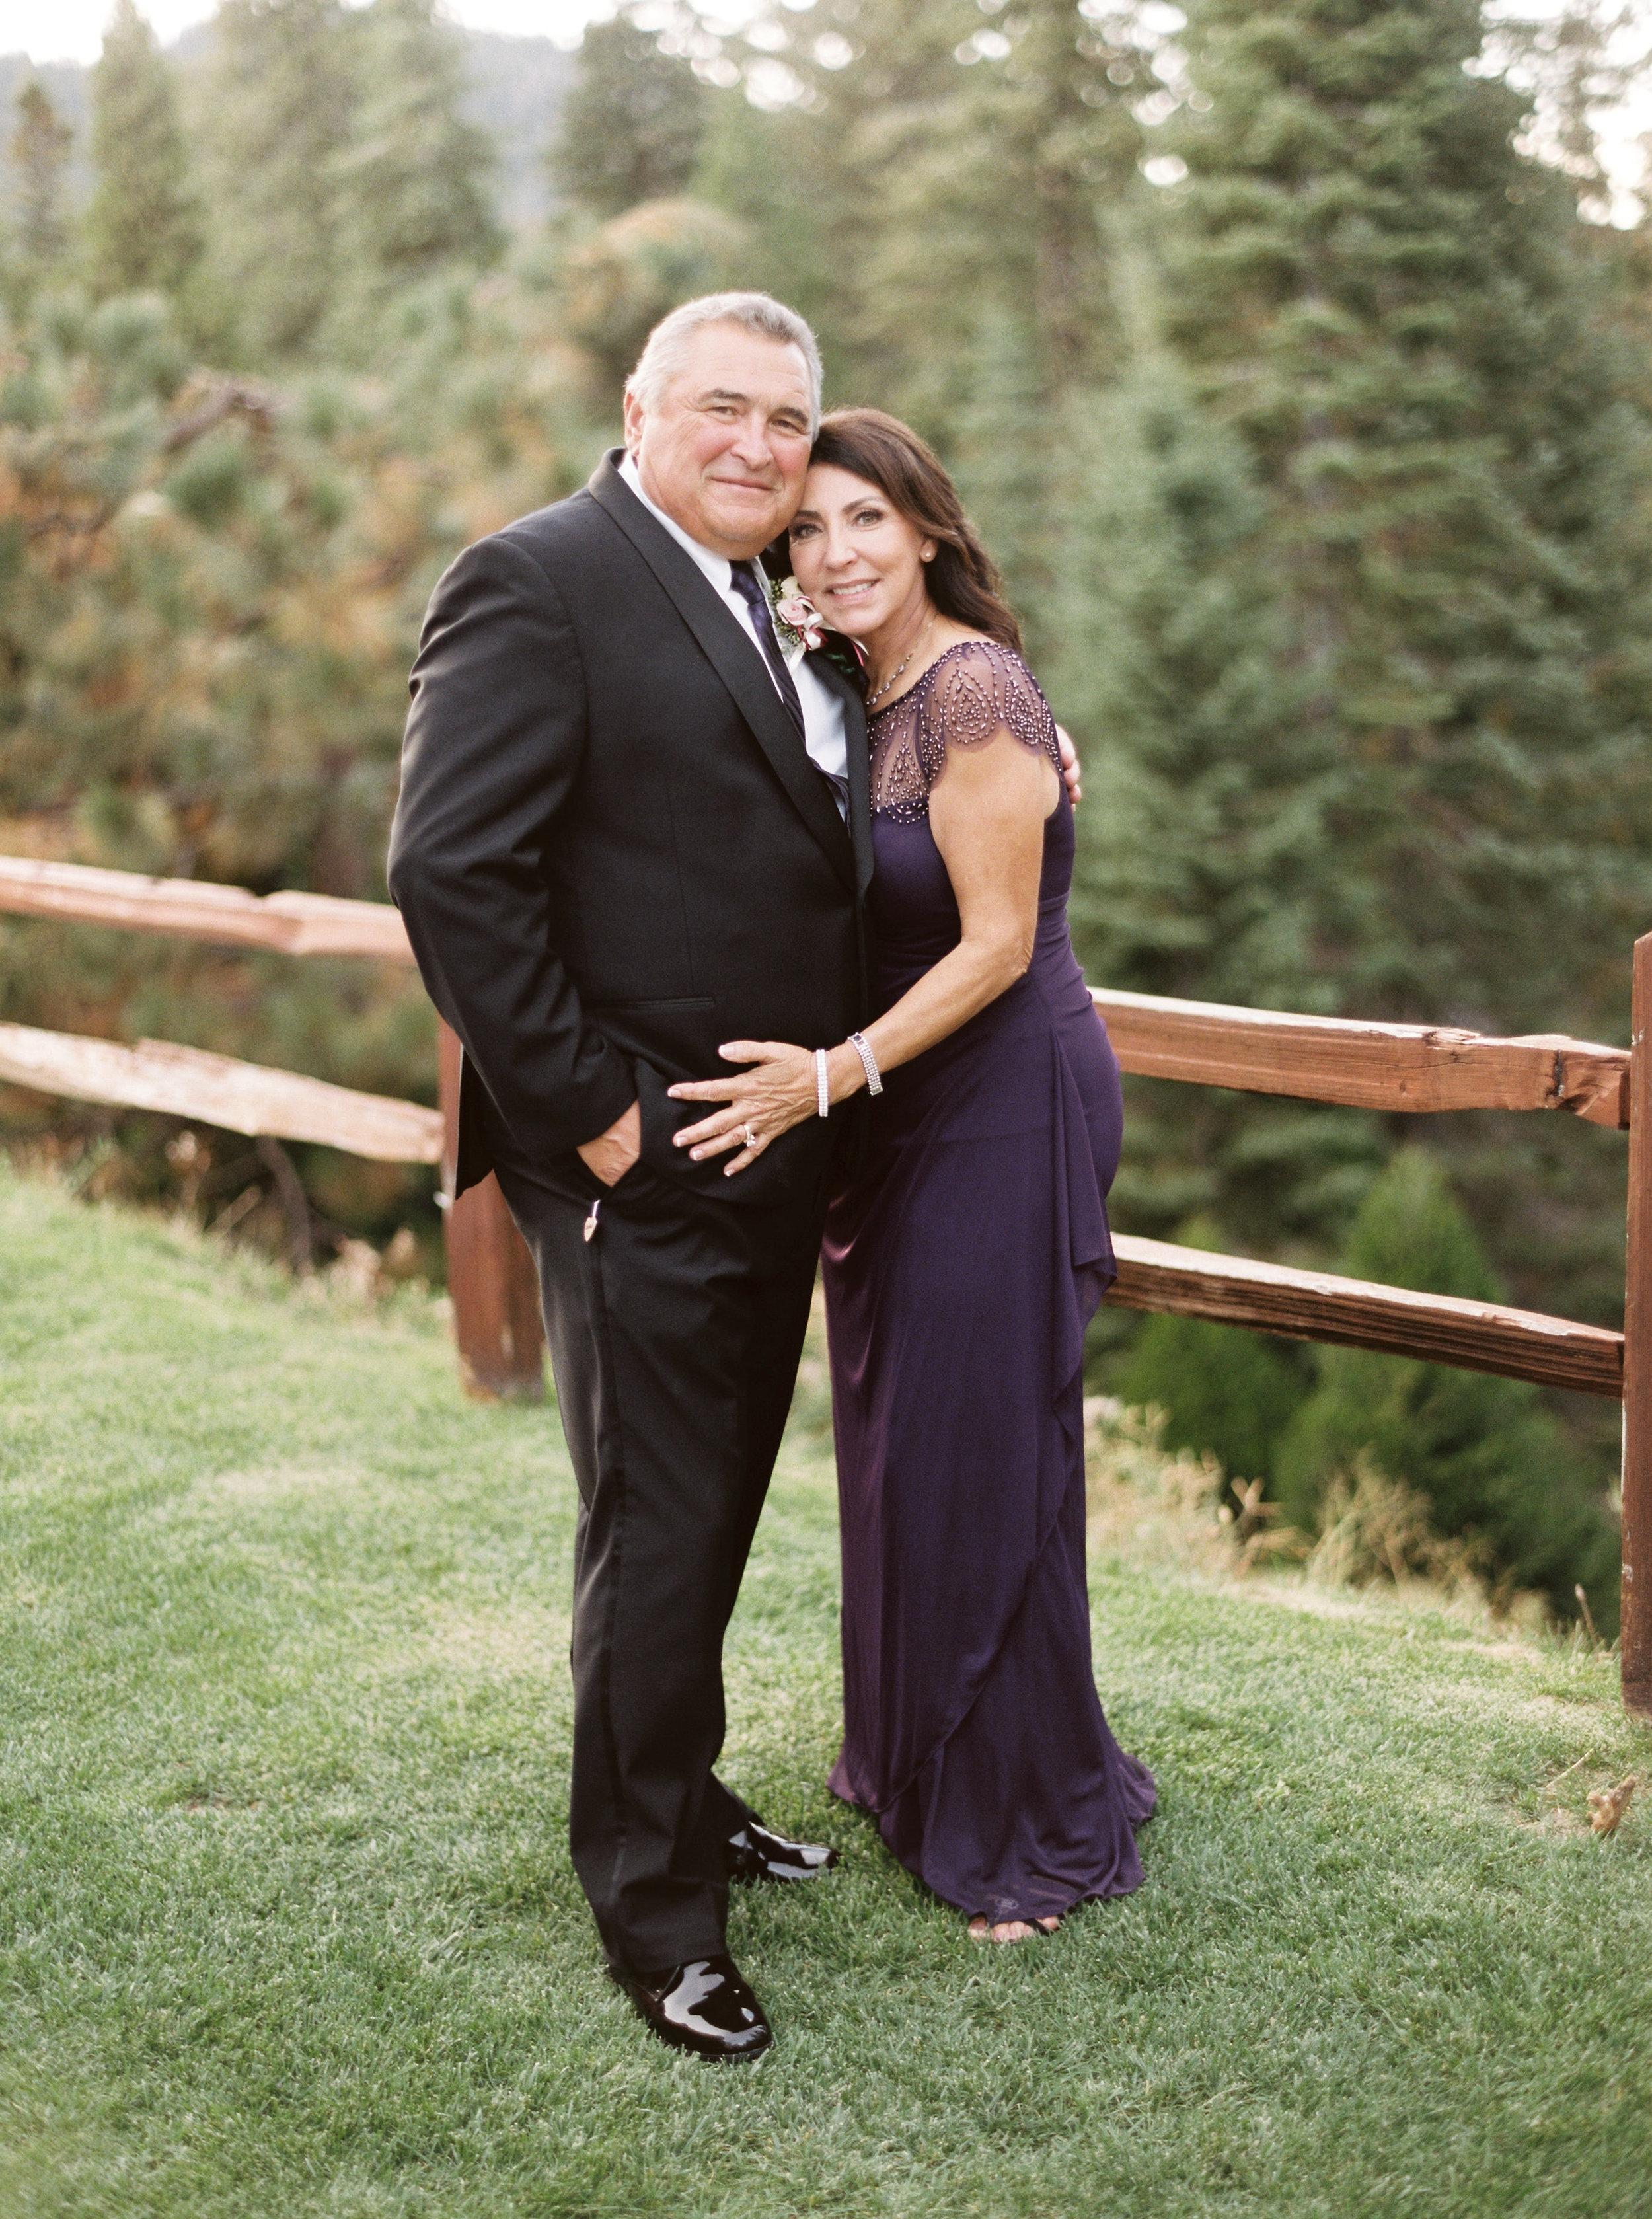 Tenaya-lodge-wedding-at-yosemite-national-park-california-92.jpg